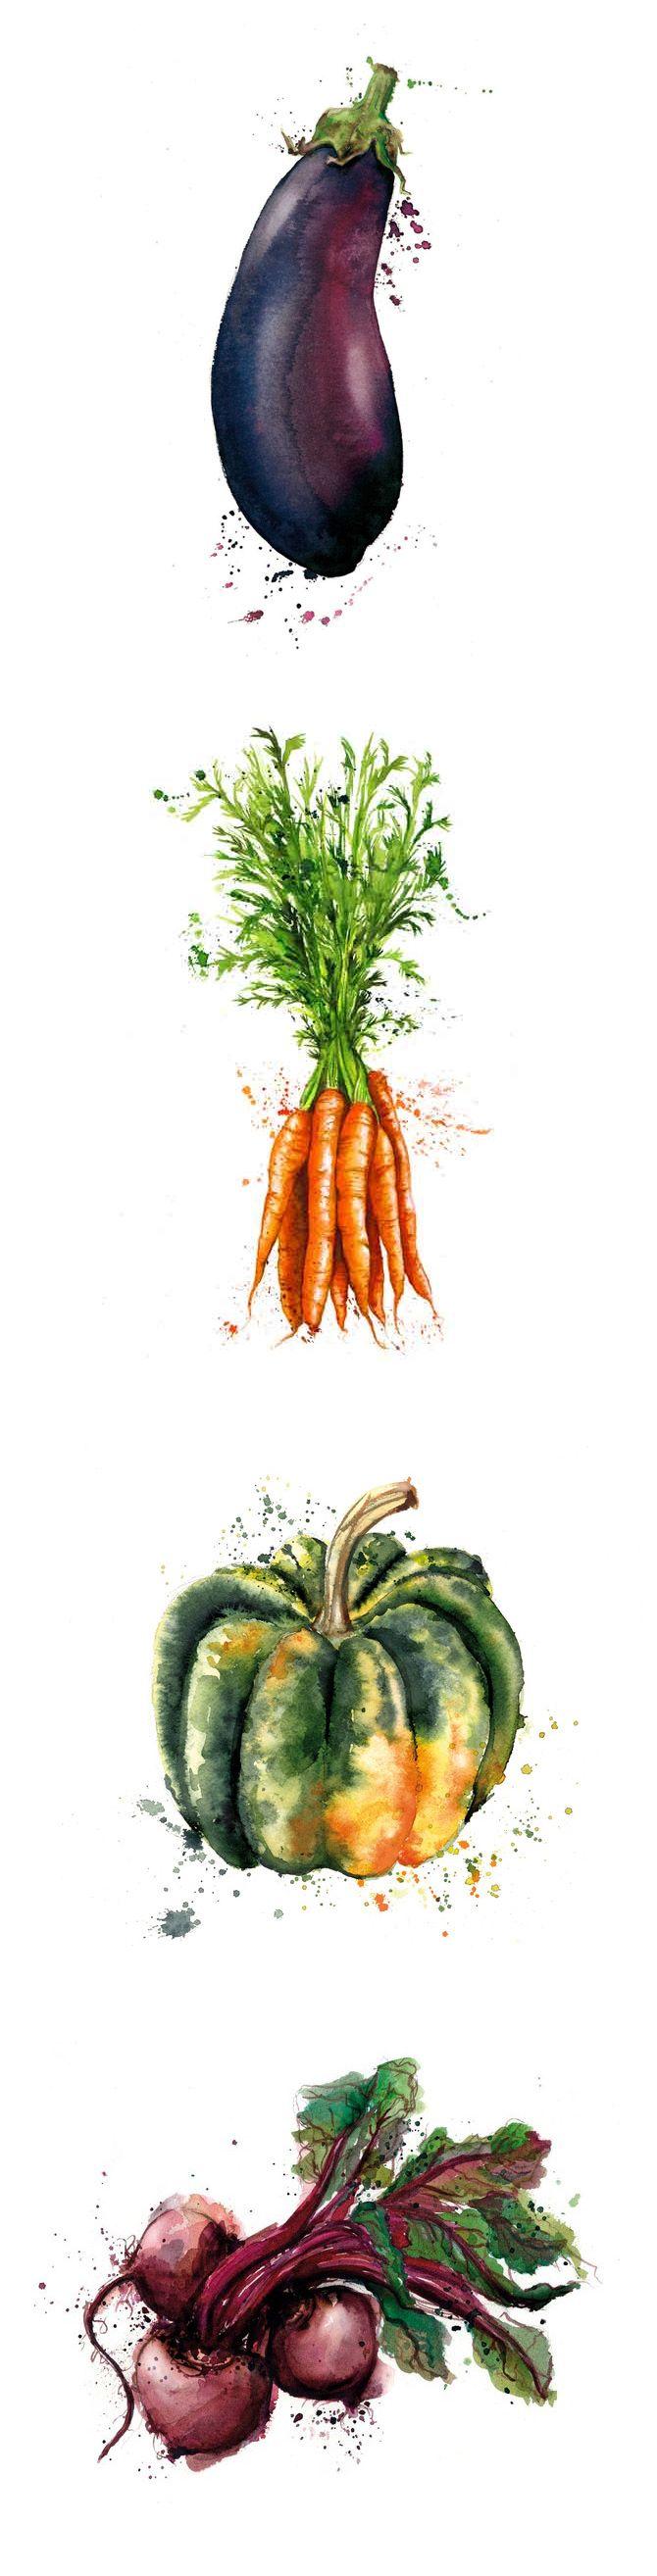 Vegetables illustration, drawing / Verdure, illustrazione, disegno - Art by Georgina Luck